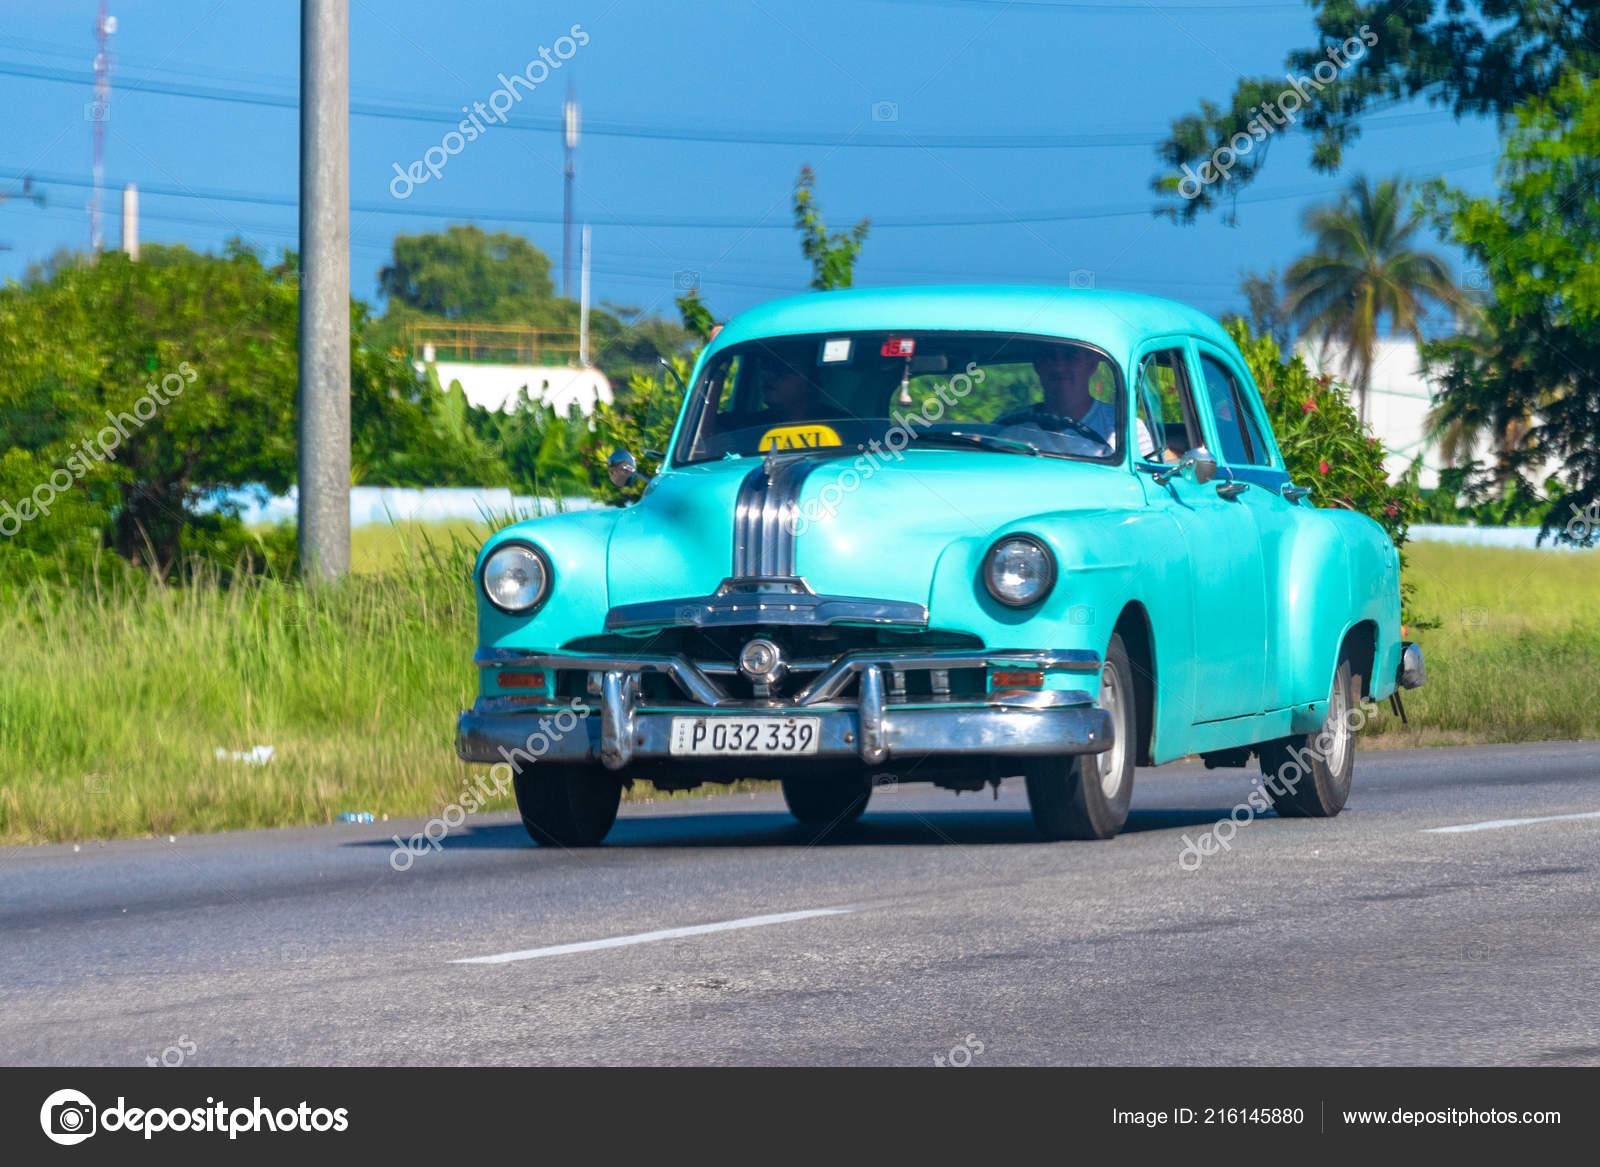 Vintage Cuban Green Car Driving Varadero Highway Vehicle Working